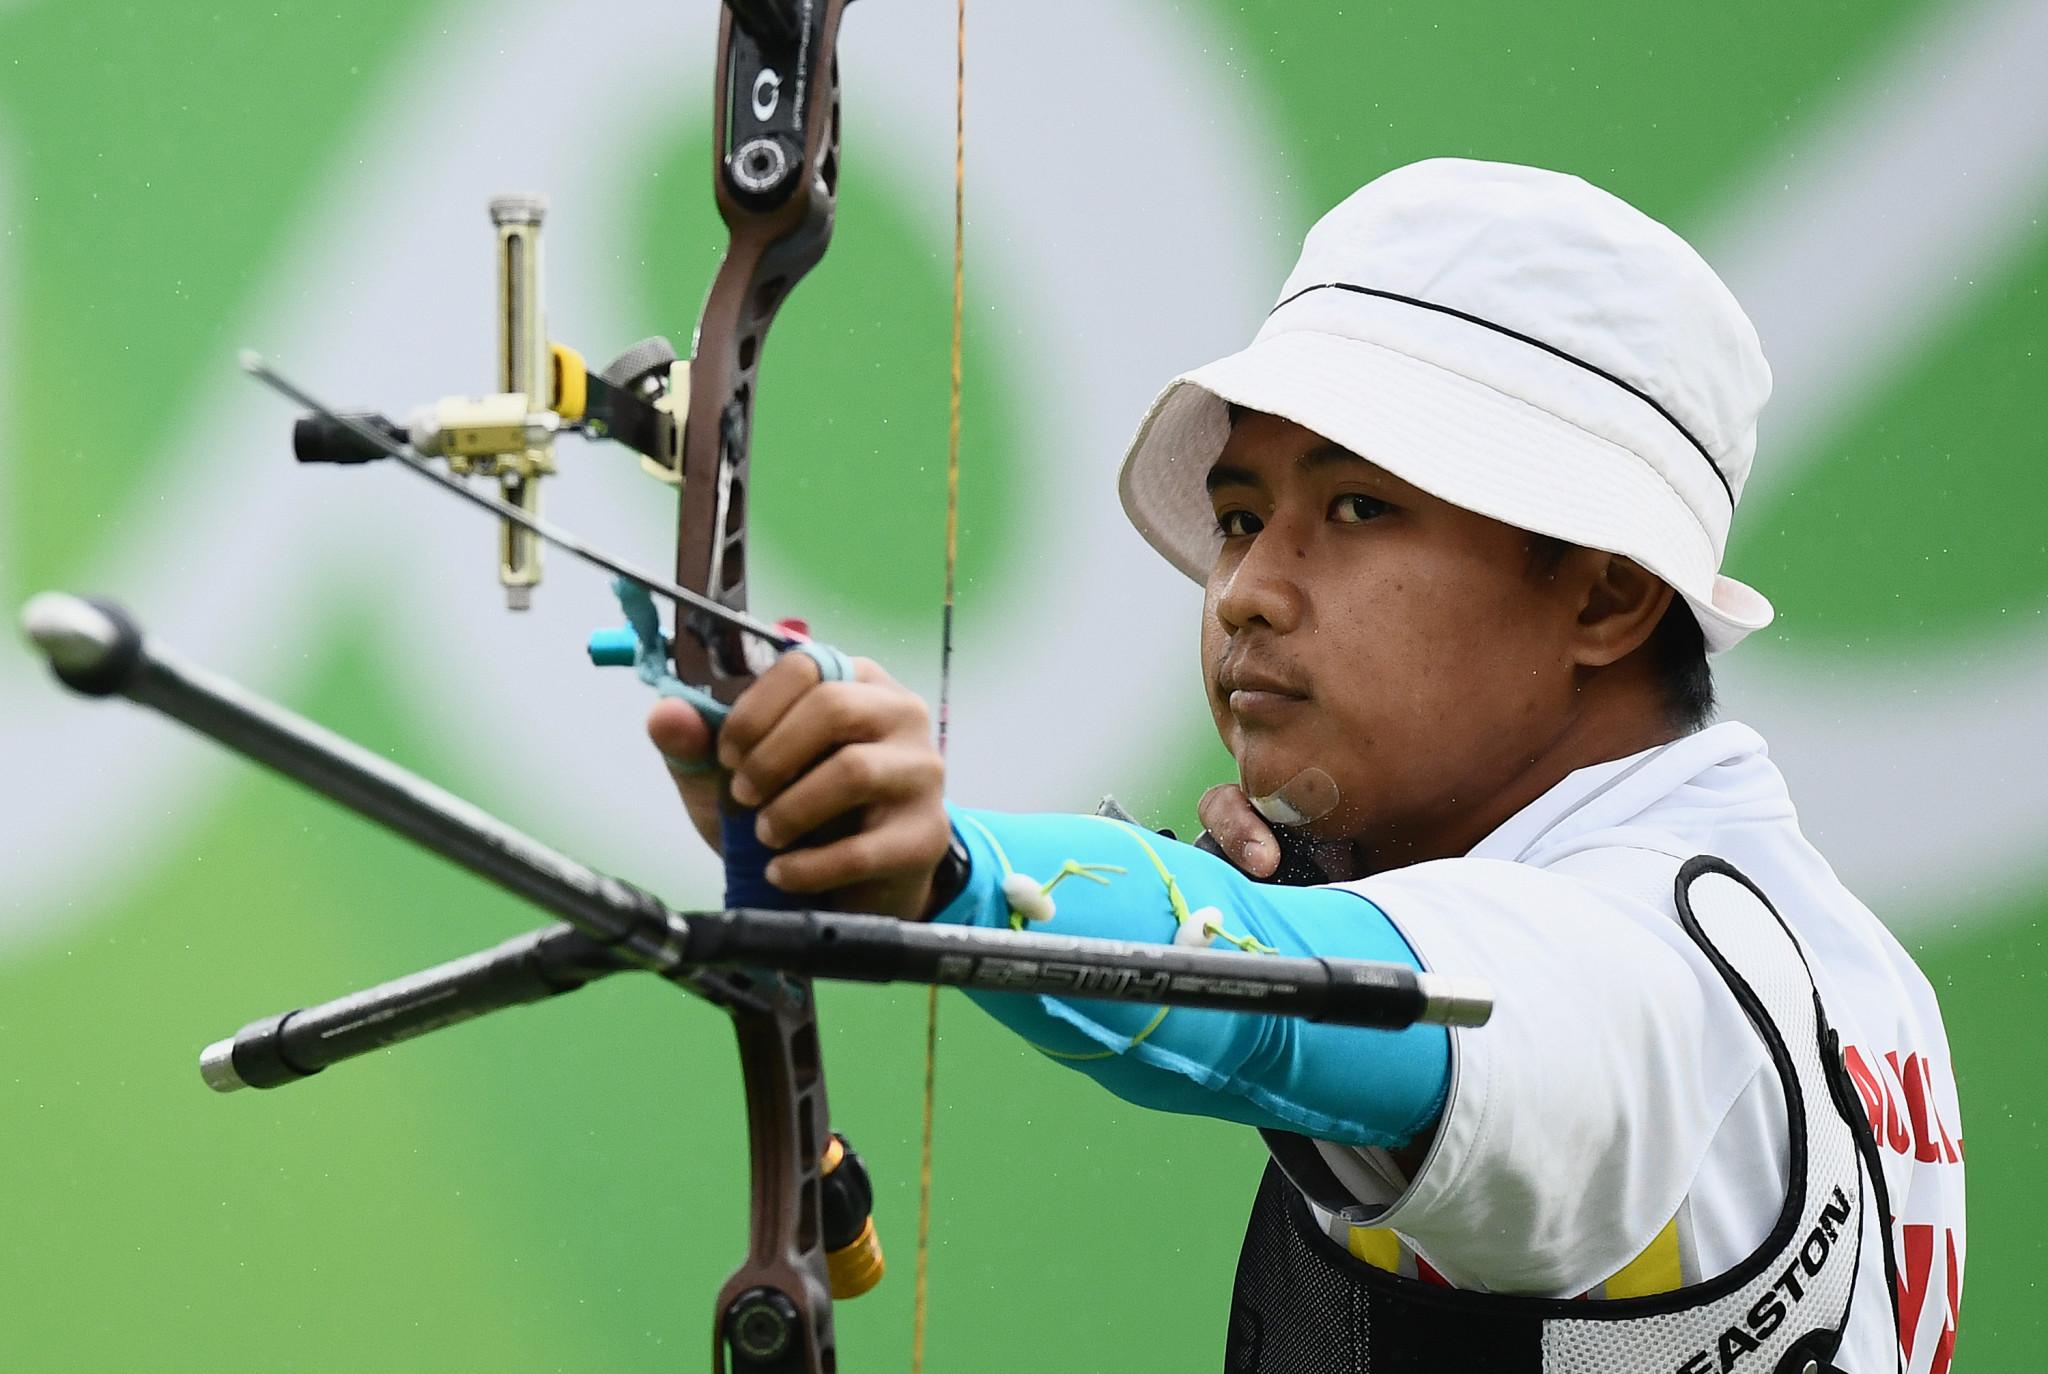 Asian Games 2018 Archery